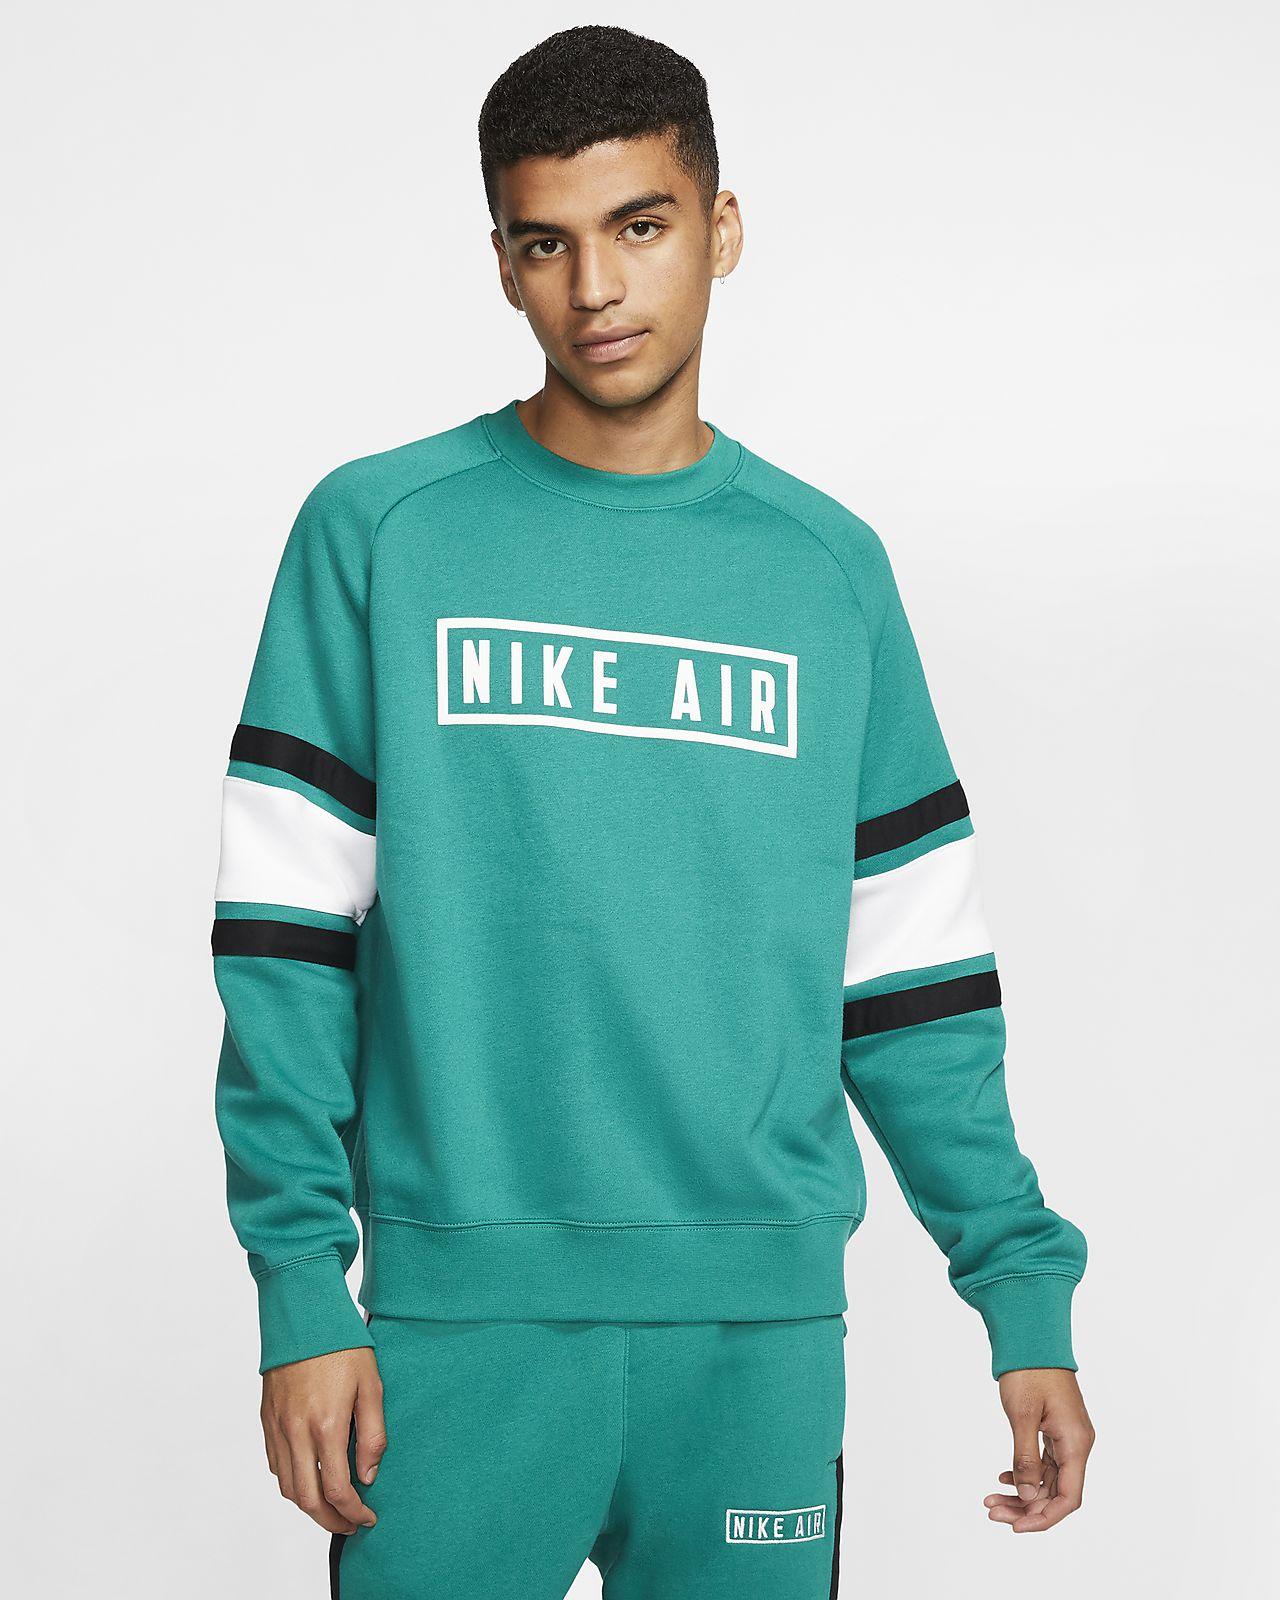 Bluza z dzianiny Nike Air